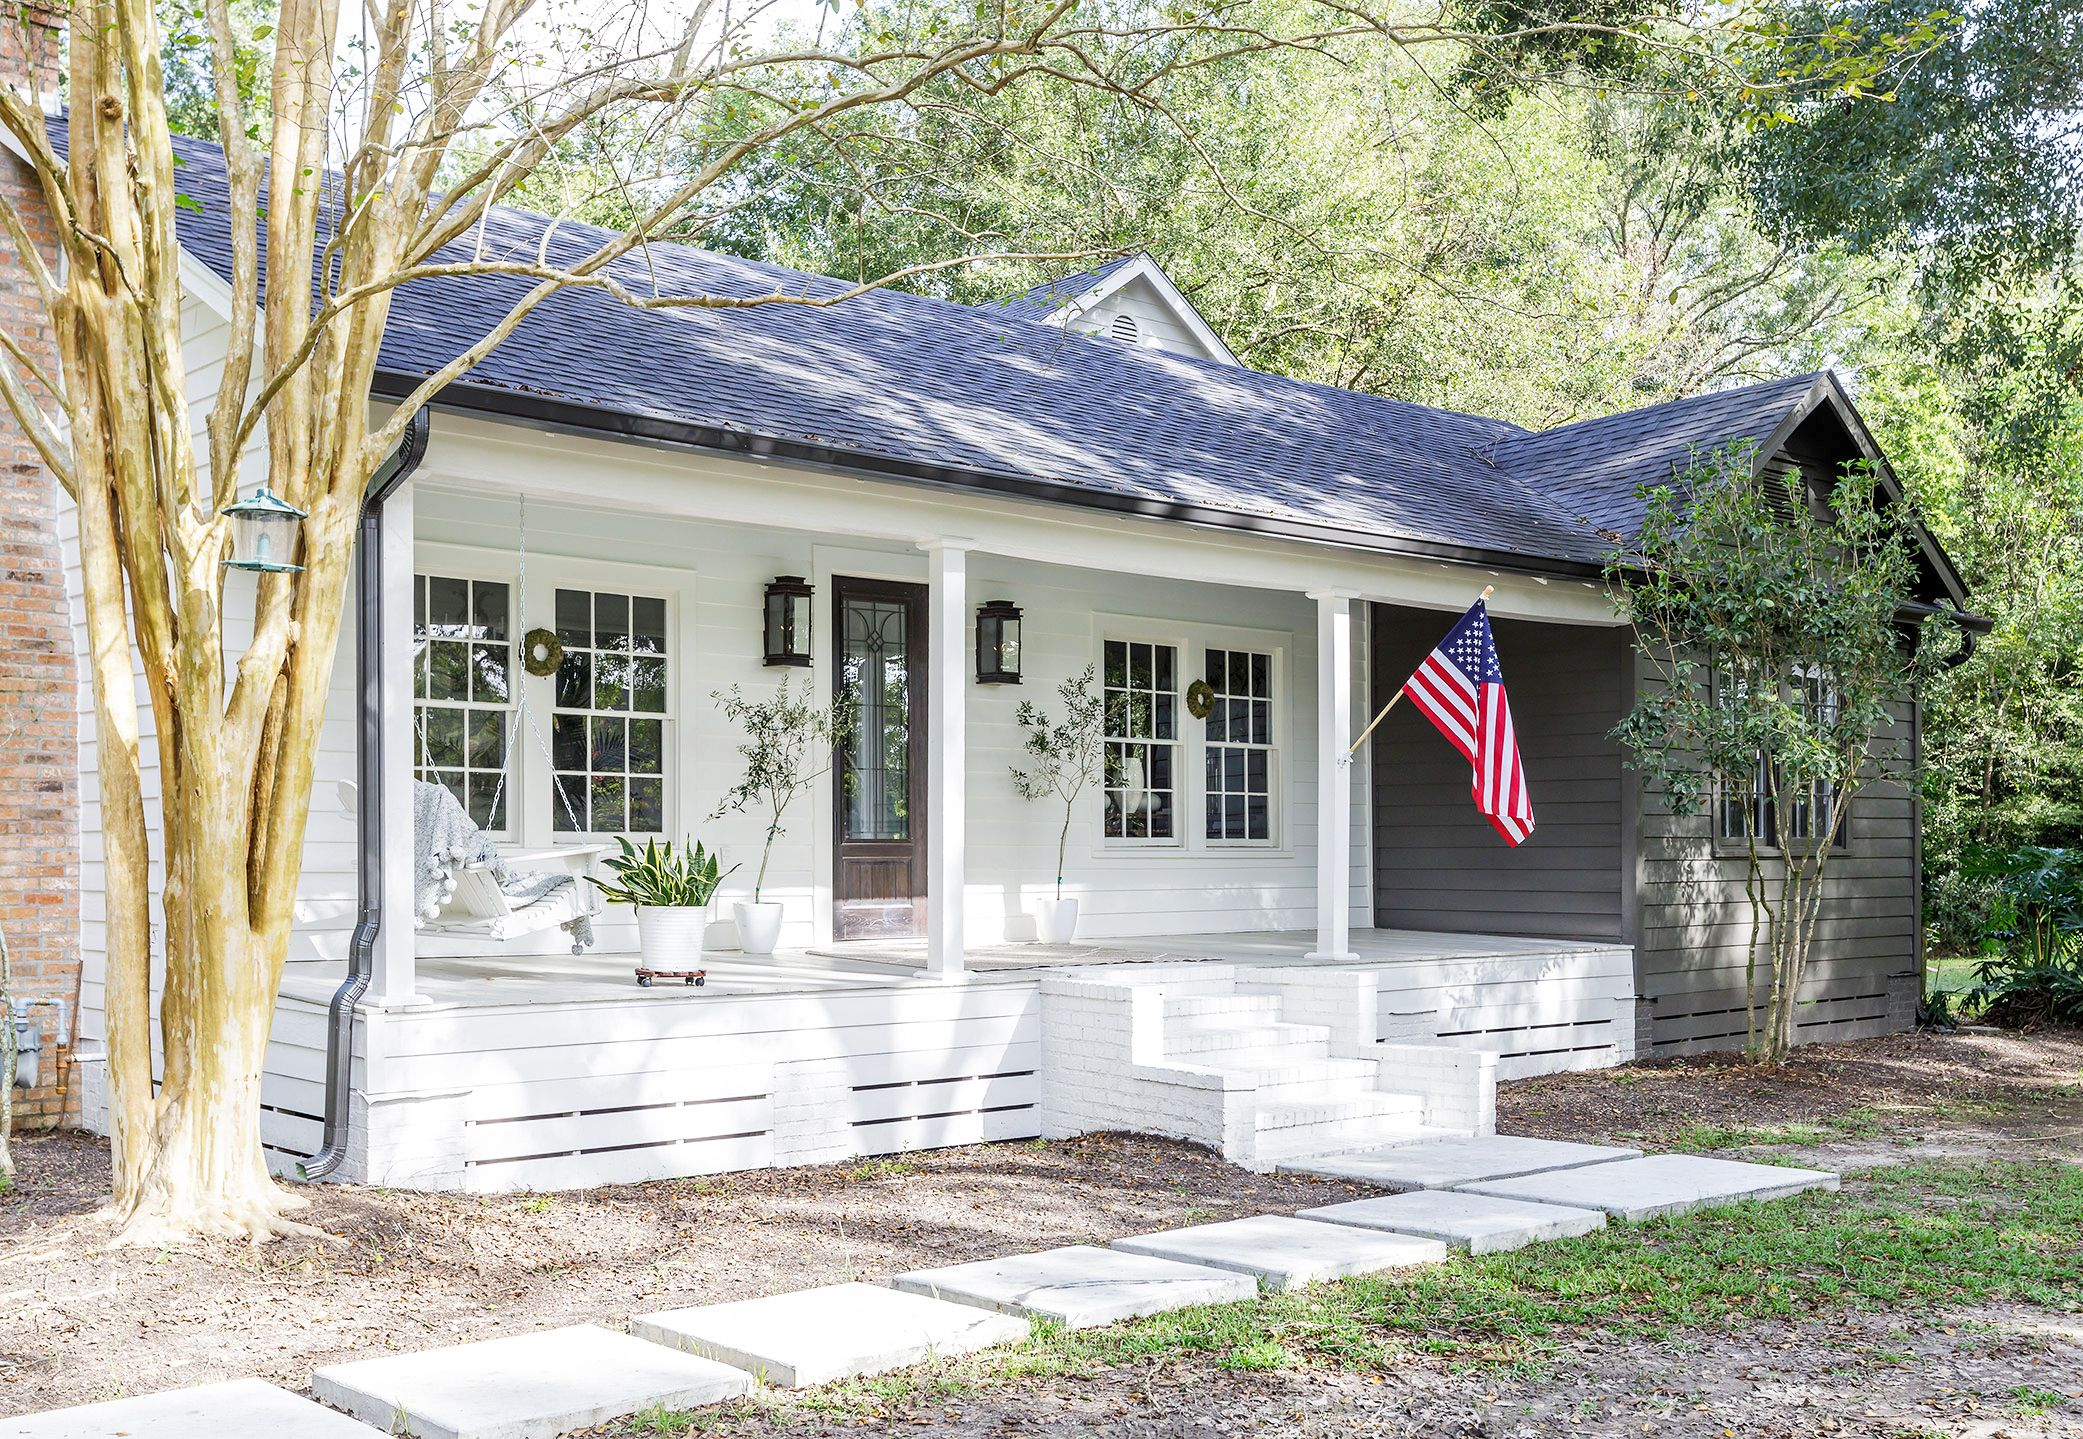 45 charming front porch ideas porch